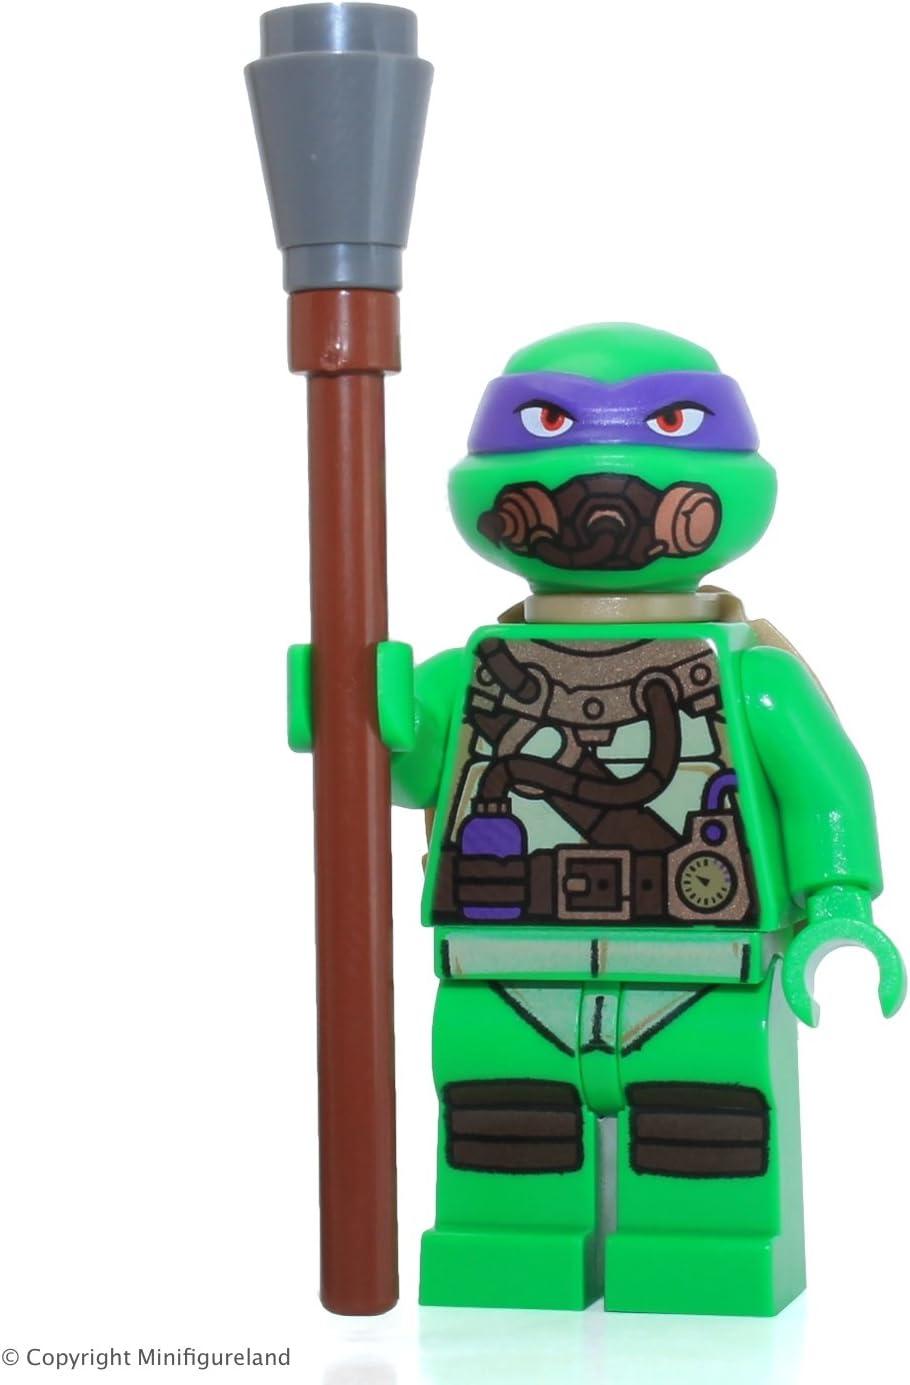 LEGO TMNT Teenage Mutant Ninja Turtles Minifigure - Donatello (in Scuba Gear) 79121